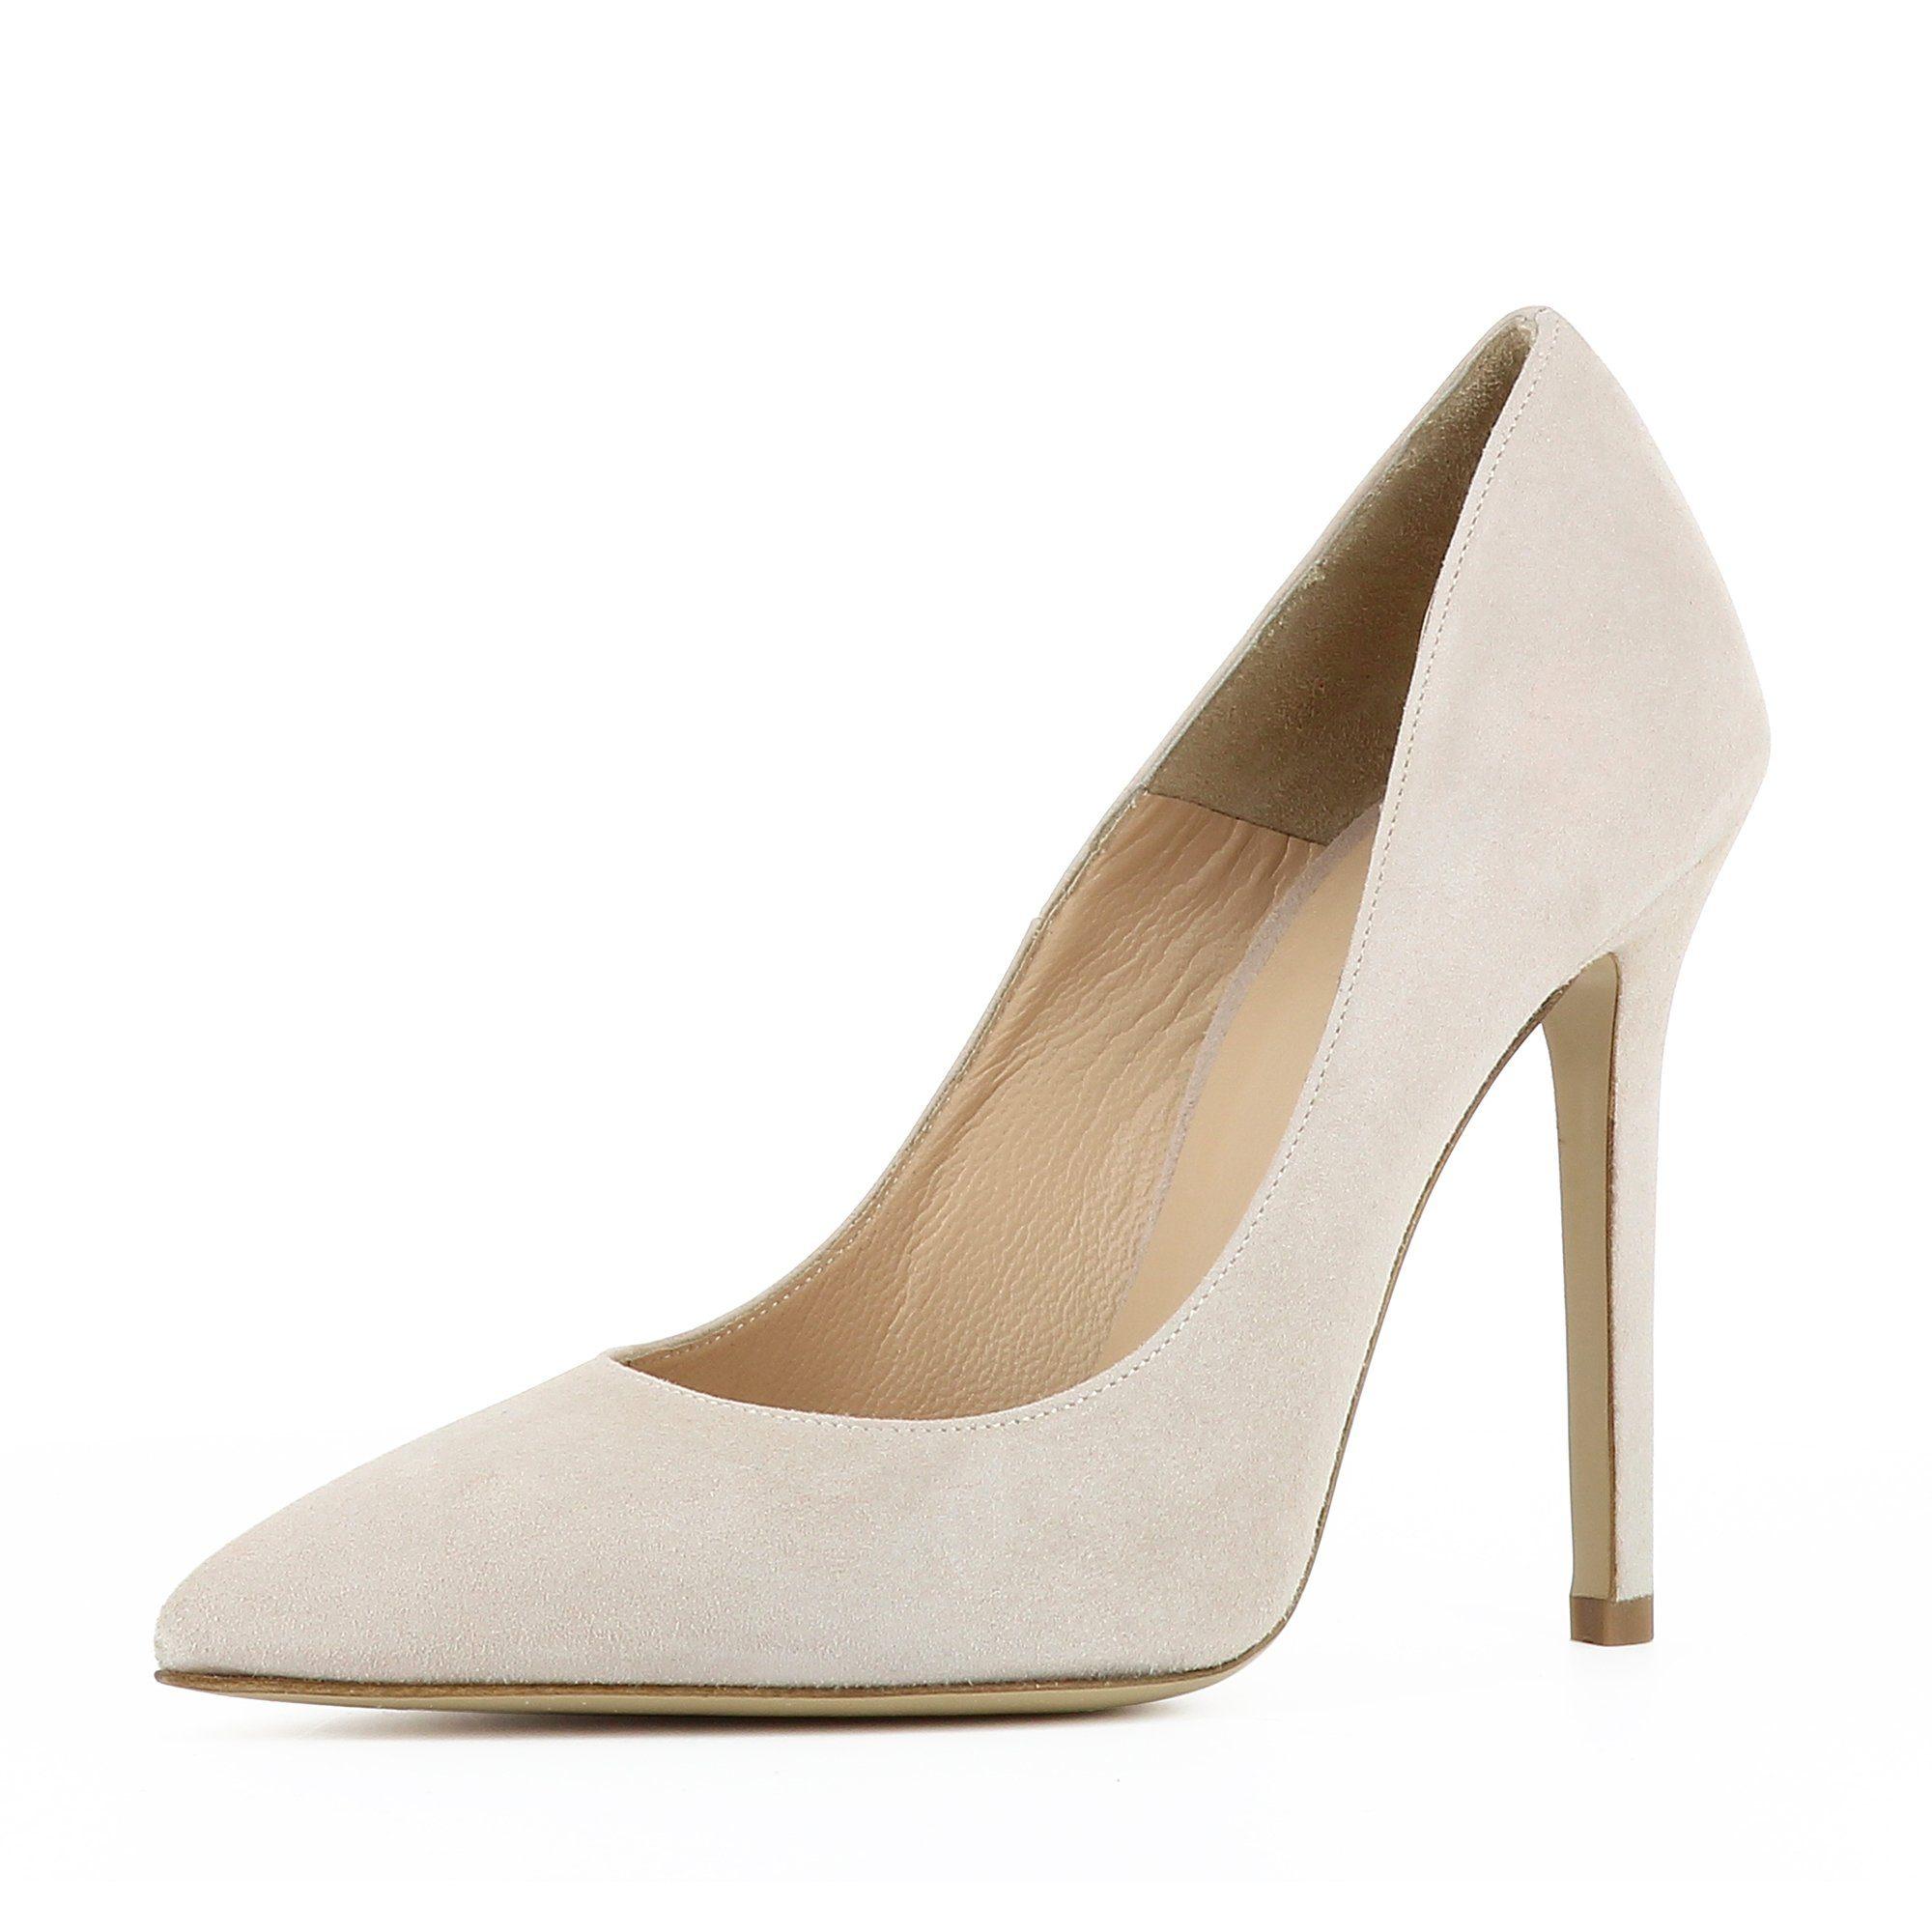 Evita MIA High-Heel-Pumps online kaufen  altrosa